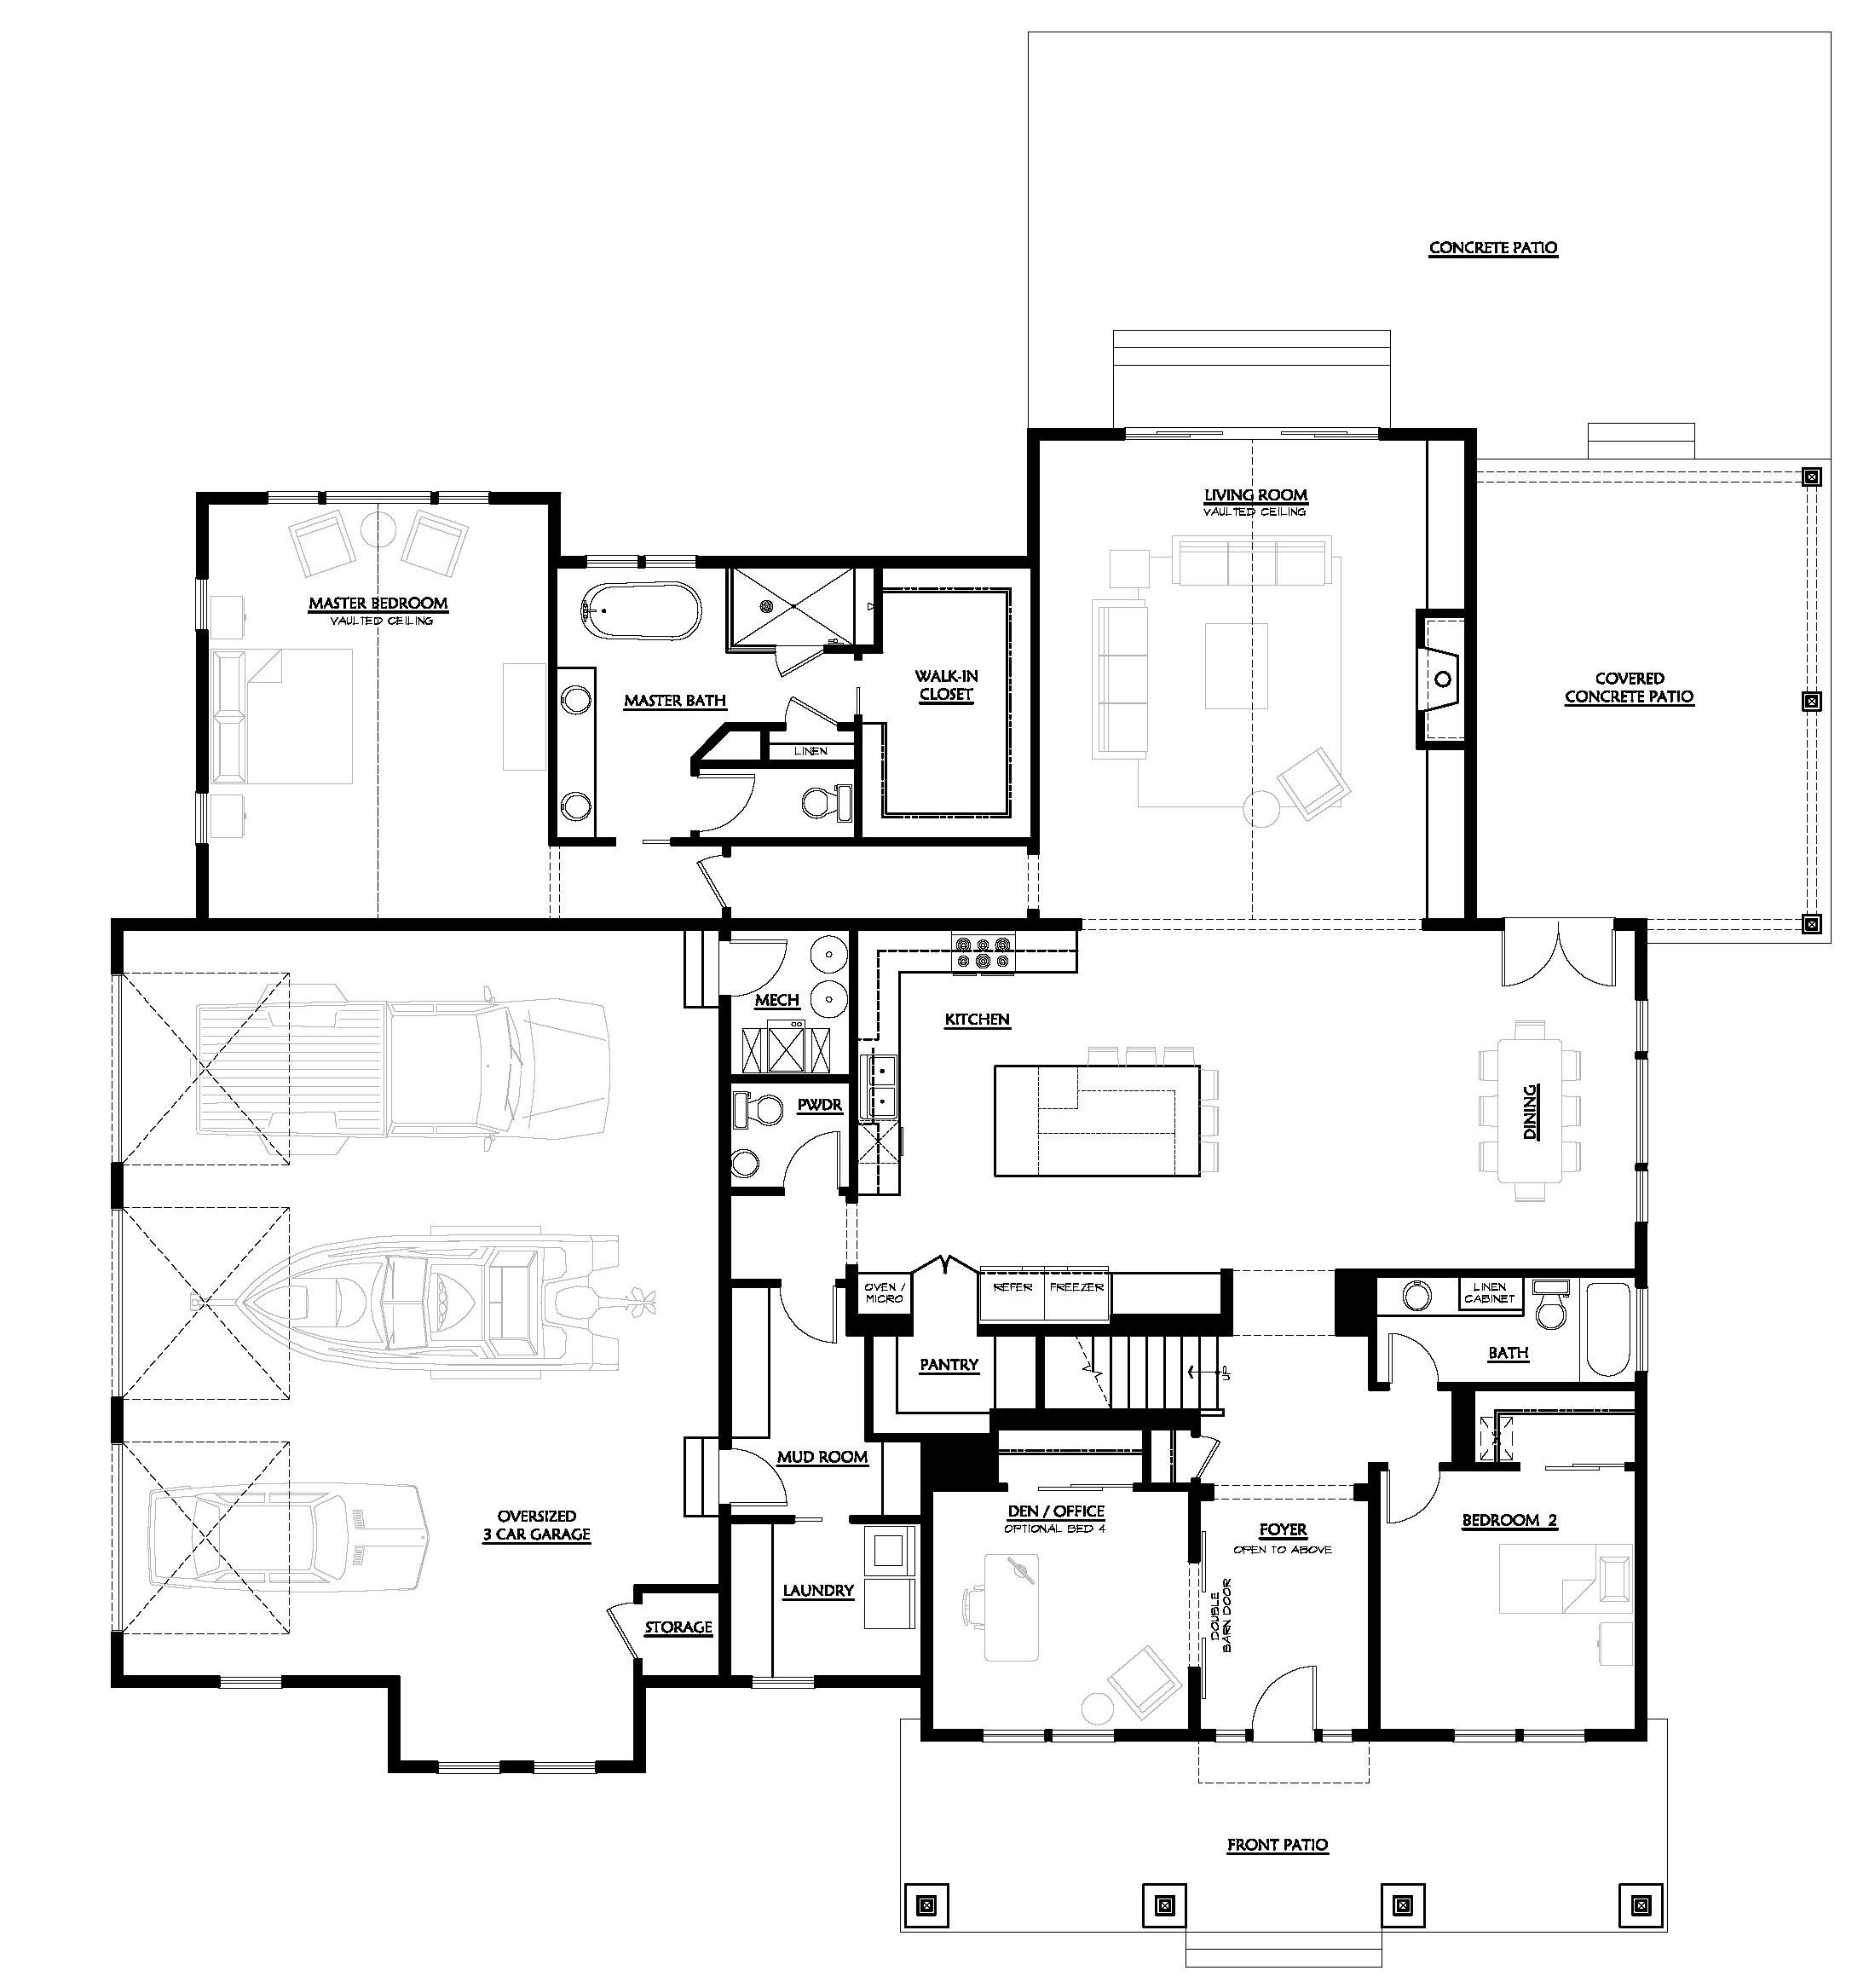 Broder Marketing Floor Plan - MF.jpg